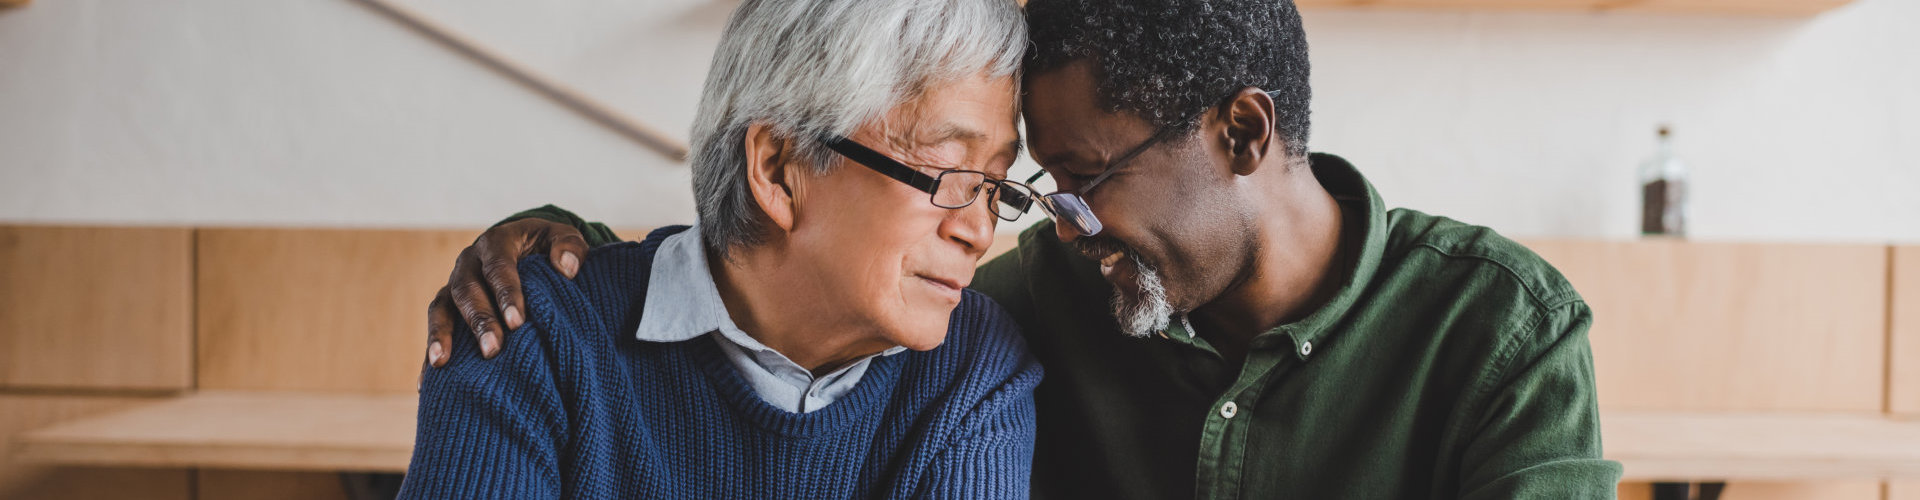 caregiver and old man talking